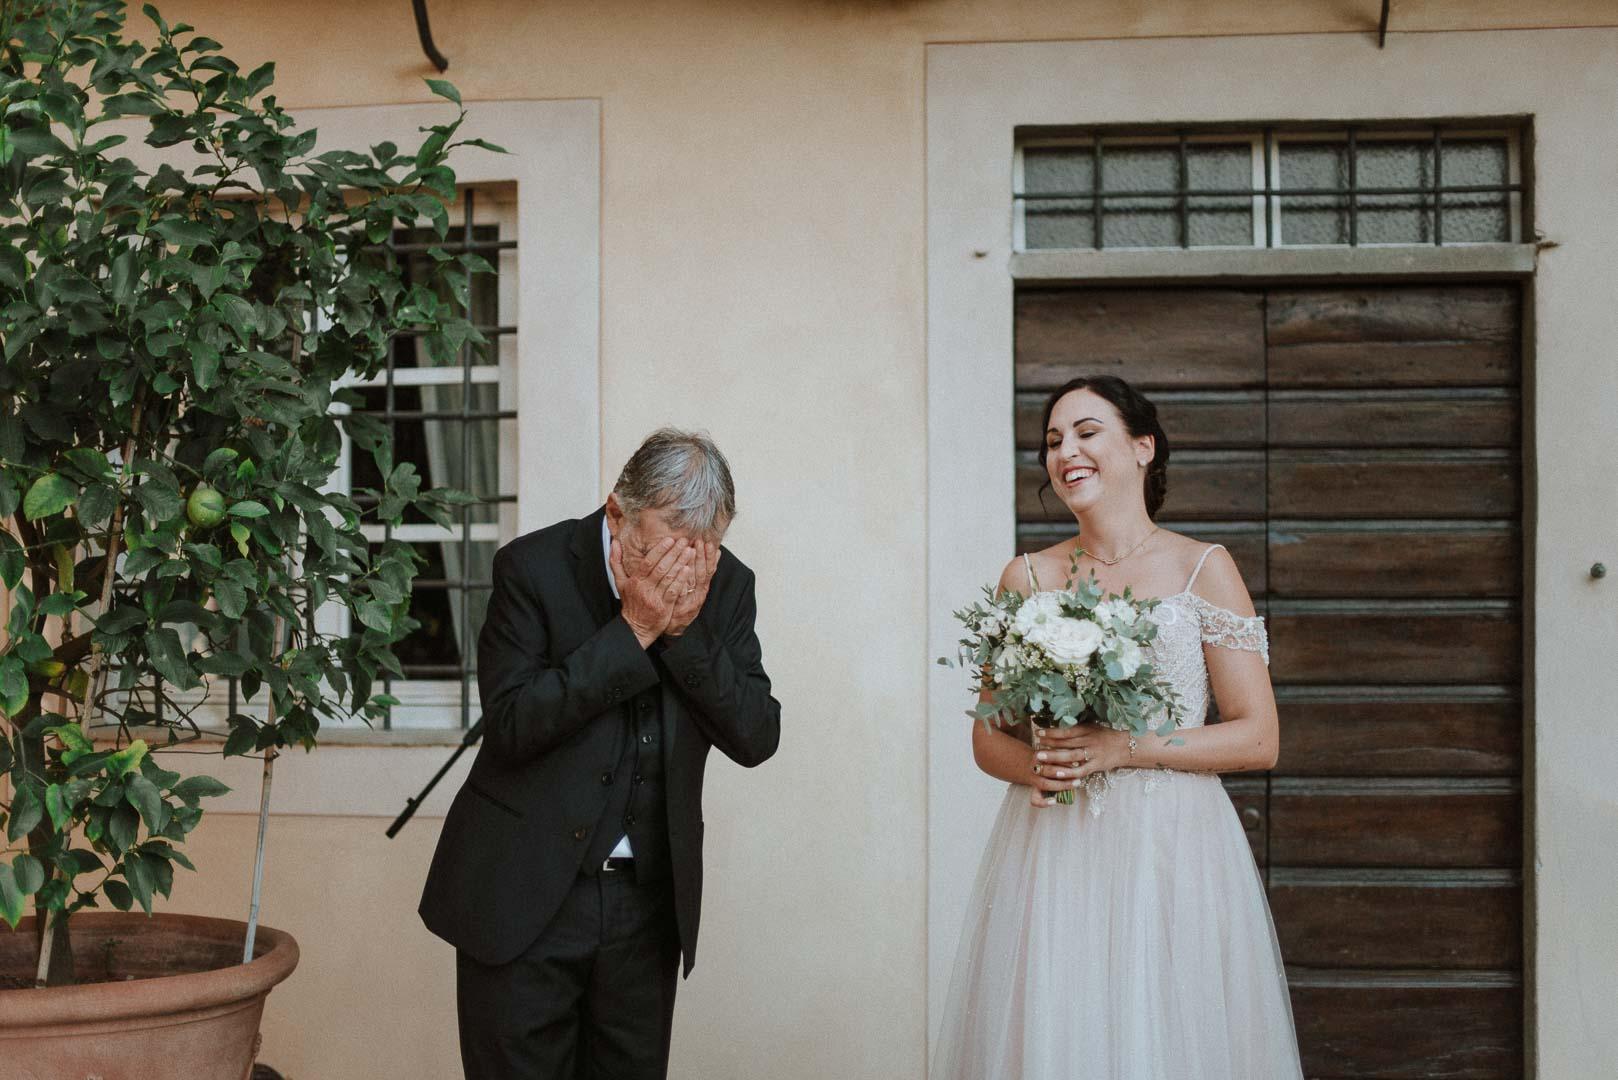 wedding-photographer-destination-fineart-bespoke-reportage-tuscany-villascorzi-vivianeizzo-spazio46-61